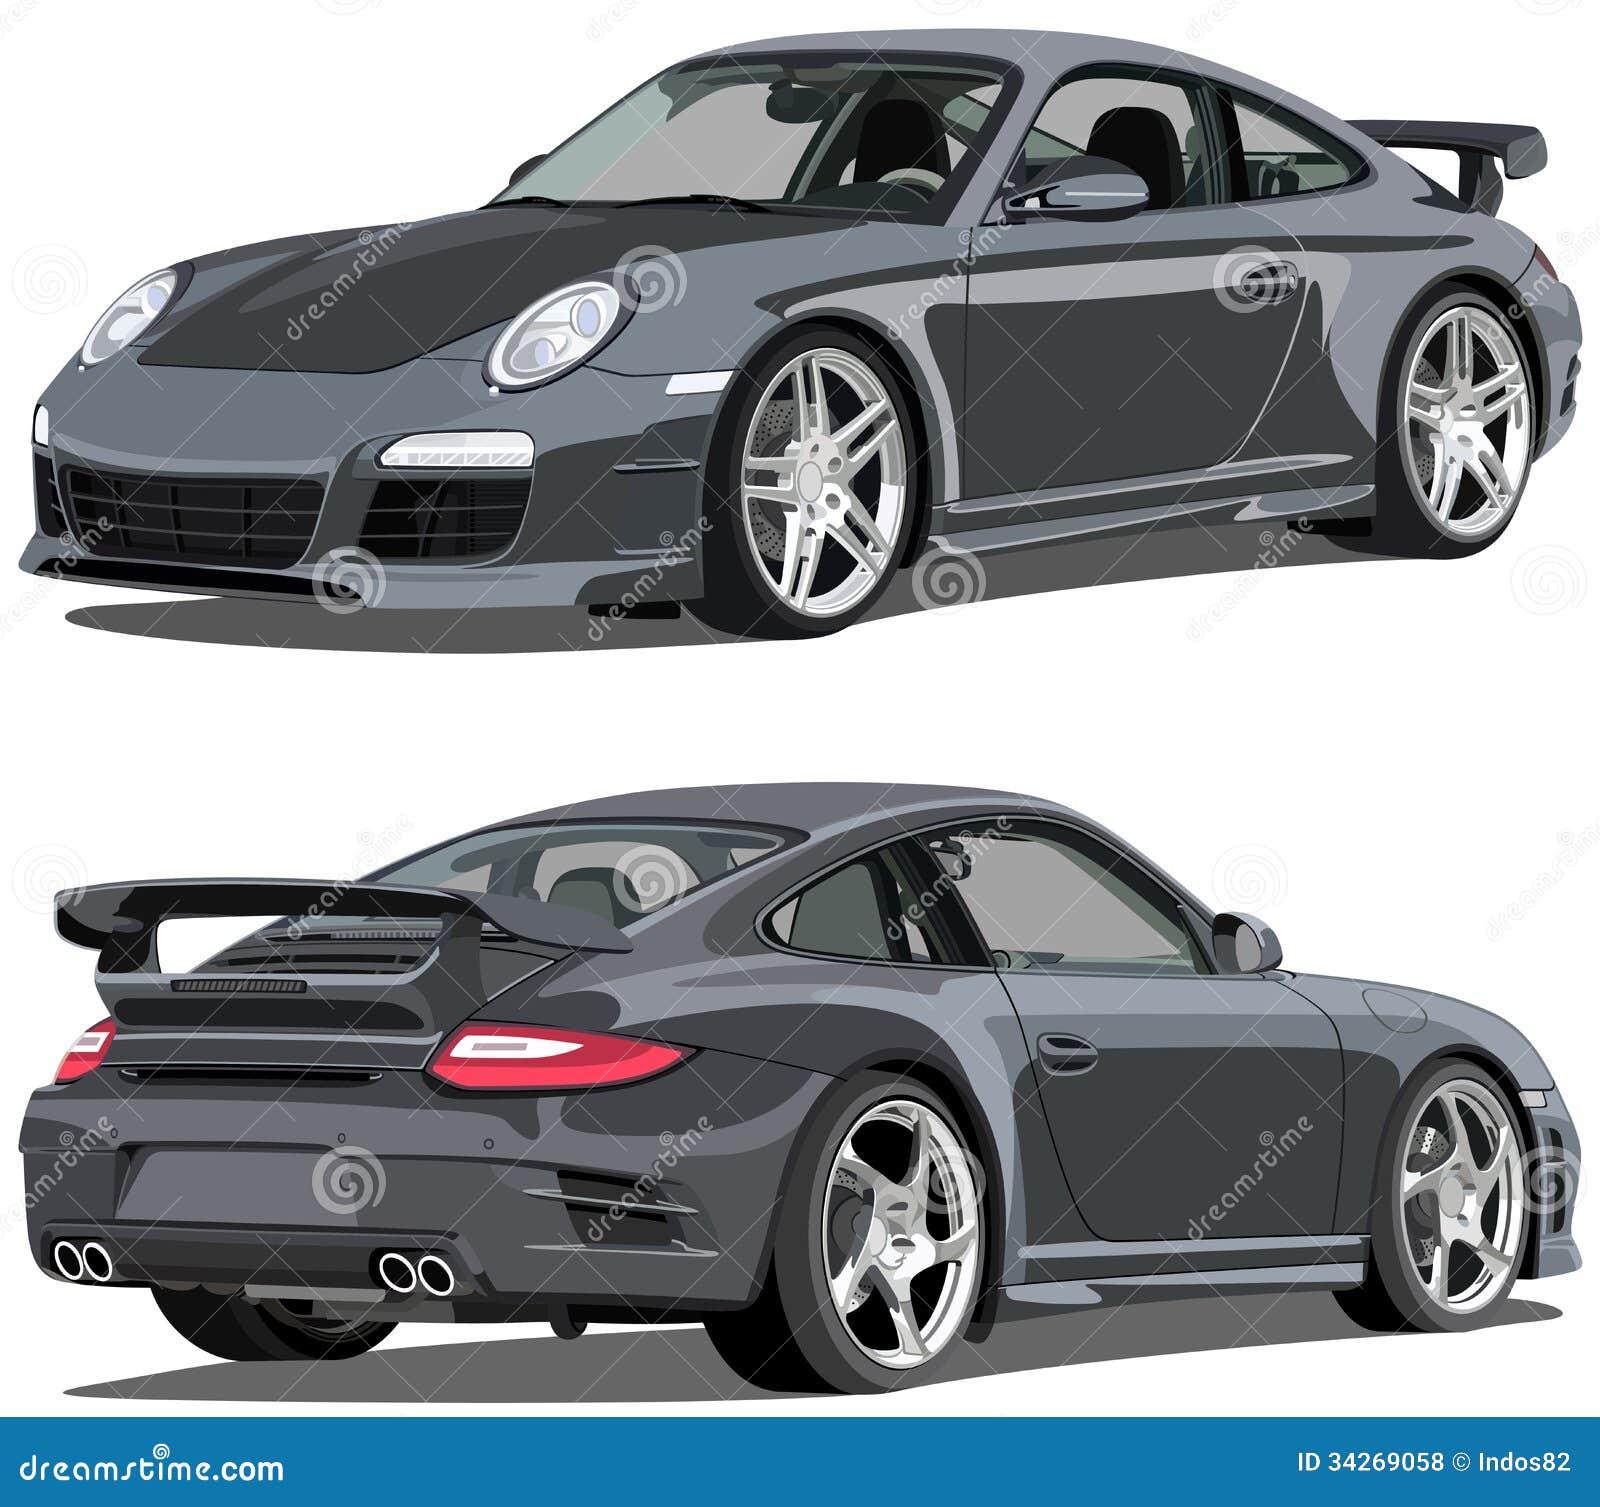 Porsche 911 Carrera Editorial Stock Photo Illustration Of